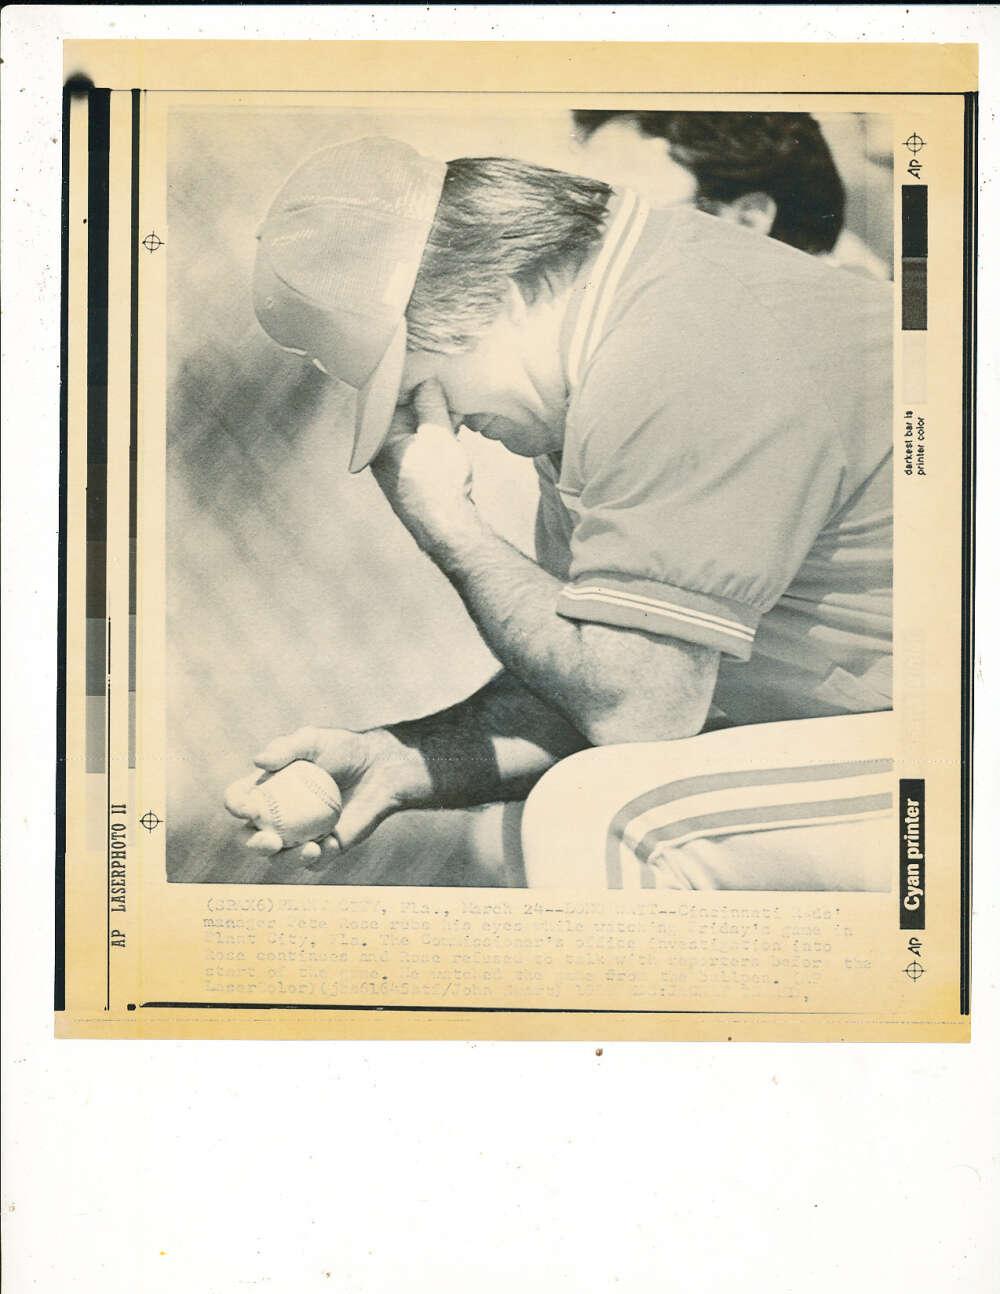 1989 Pete Rose under investigation wire photo